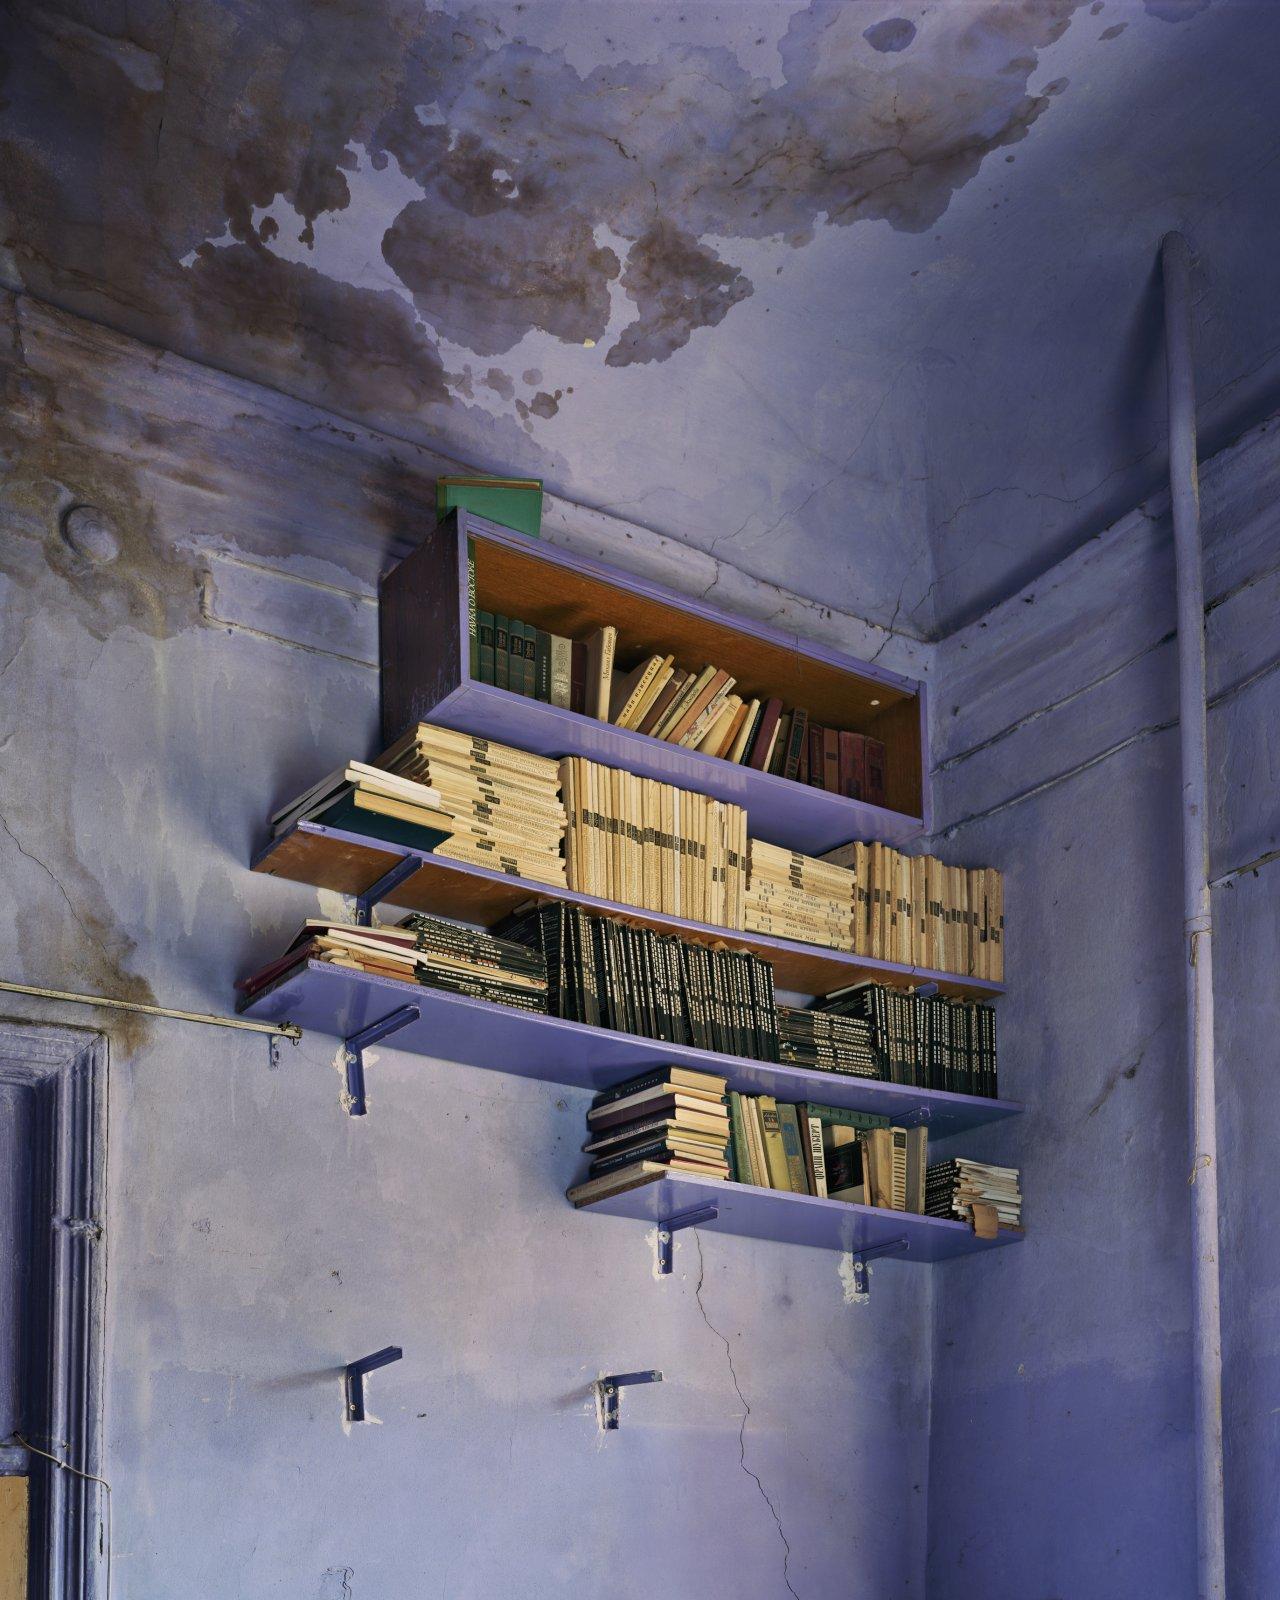 Ule's Books, Odessa, 2018 © Alec Soth / Magnum Photos